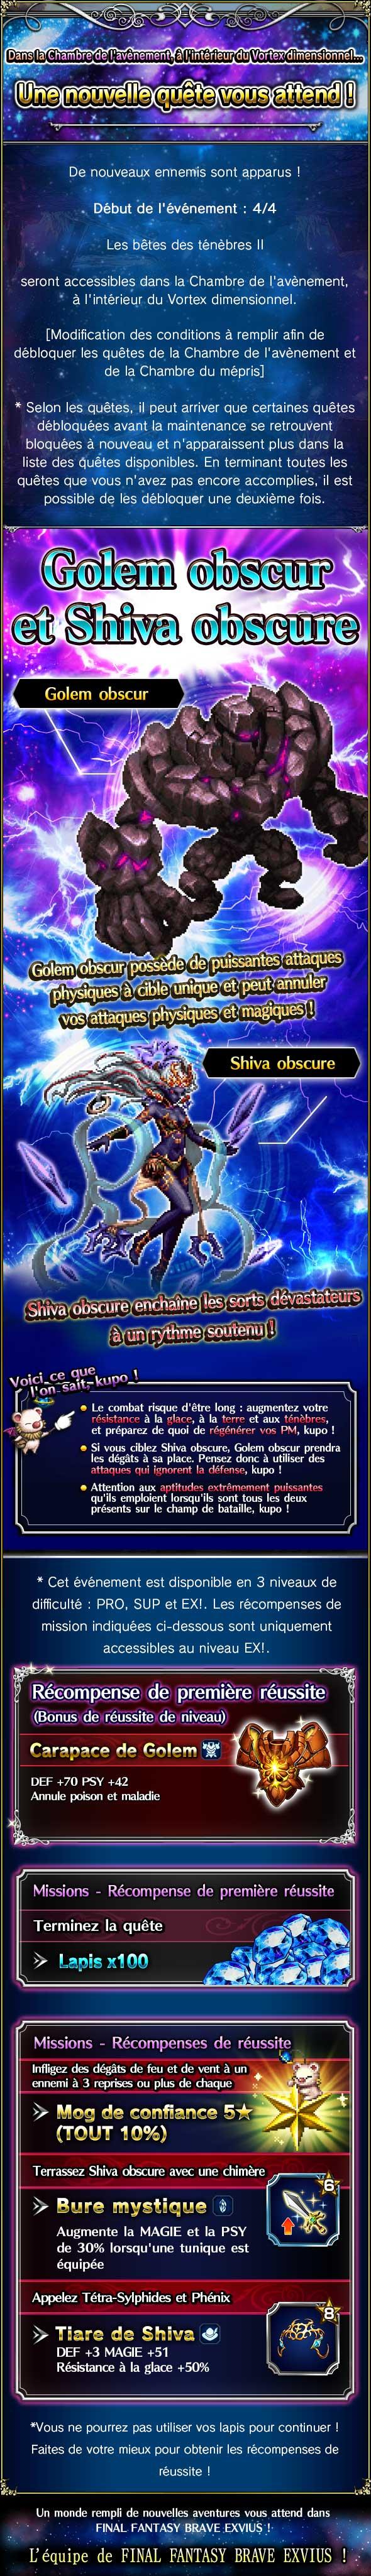 Trial - Les bêtes des Ténèbres II (Shiva & Golem Oscurs) - à partir du 04/04/19 20190402TheFallenBeastsoftheDarkII